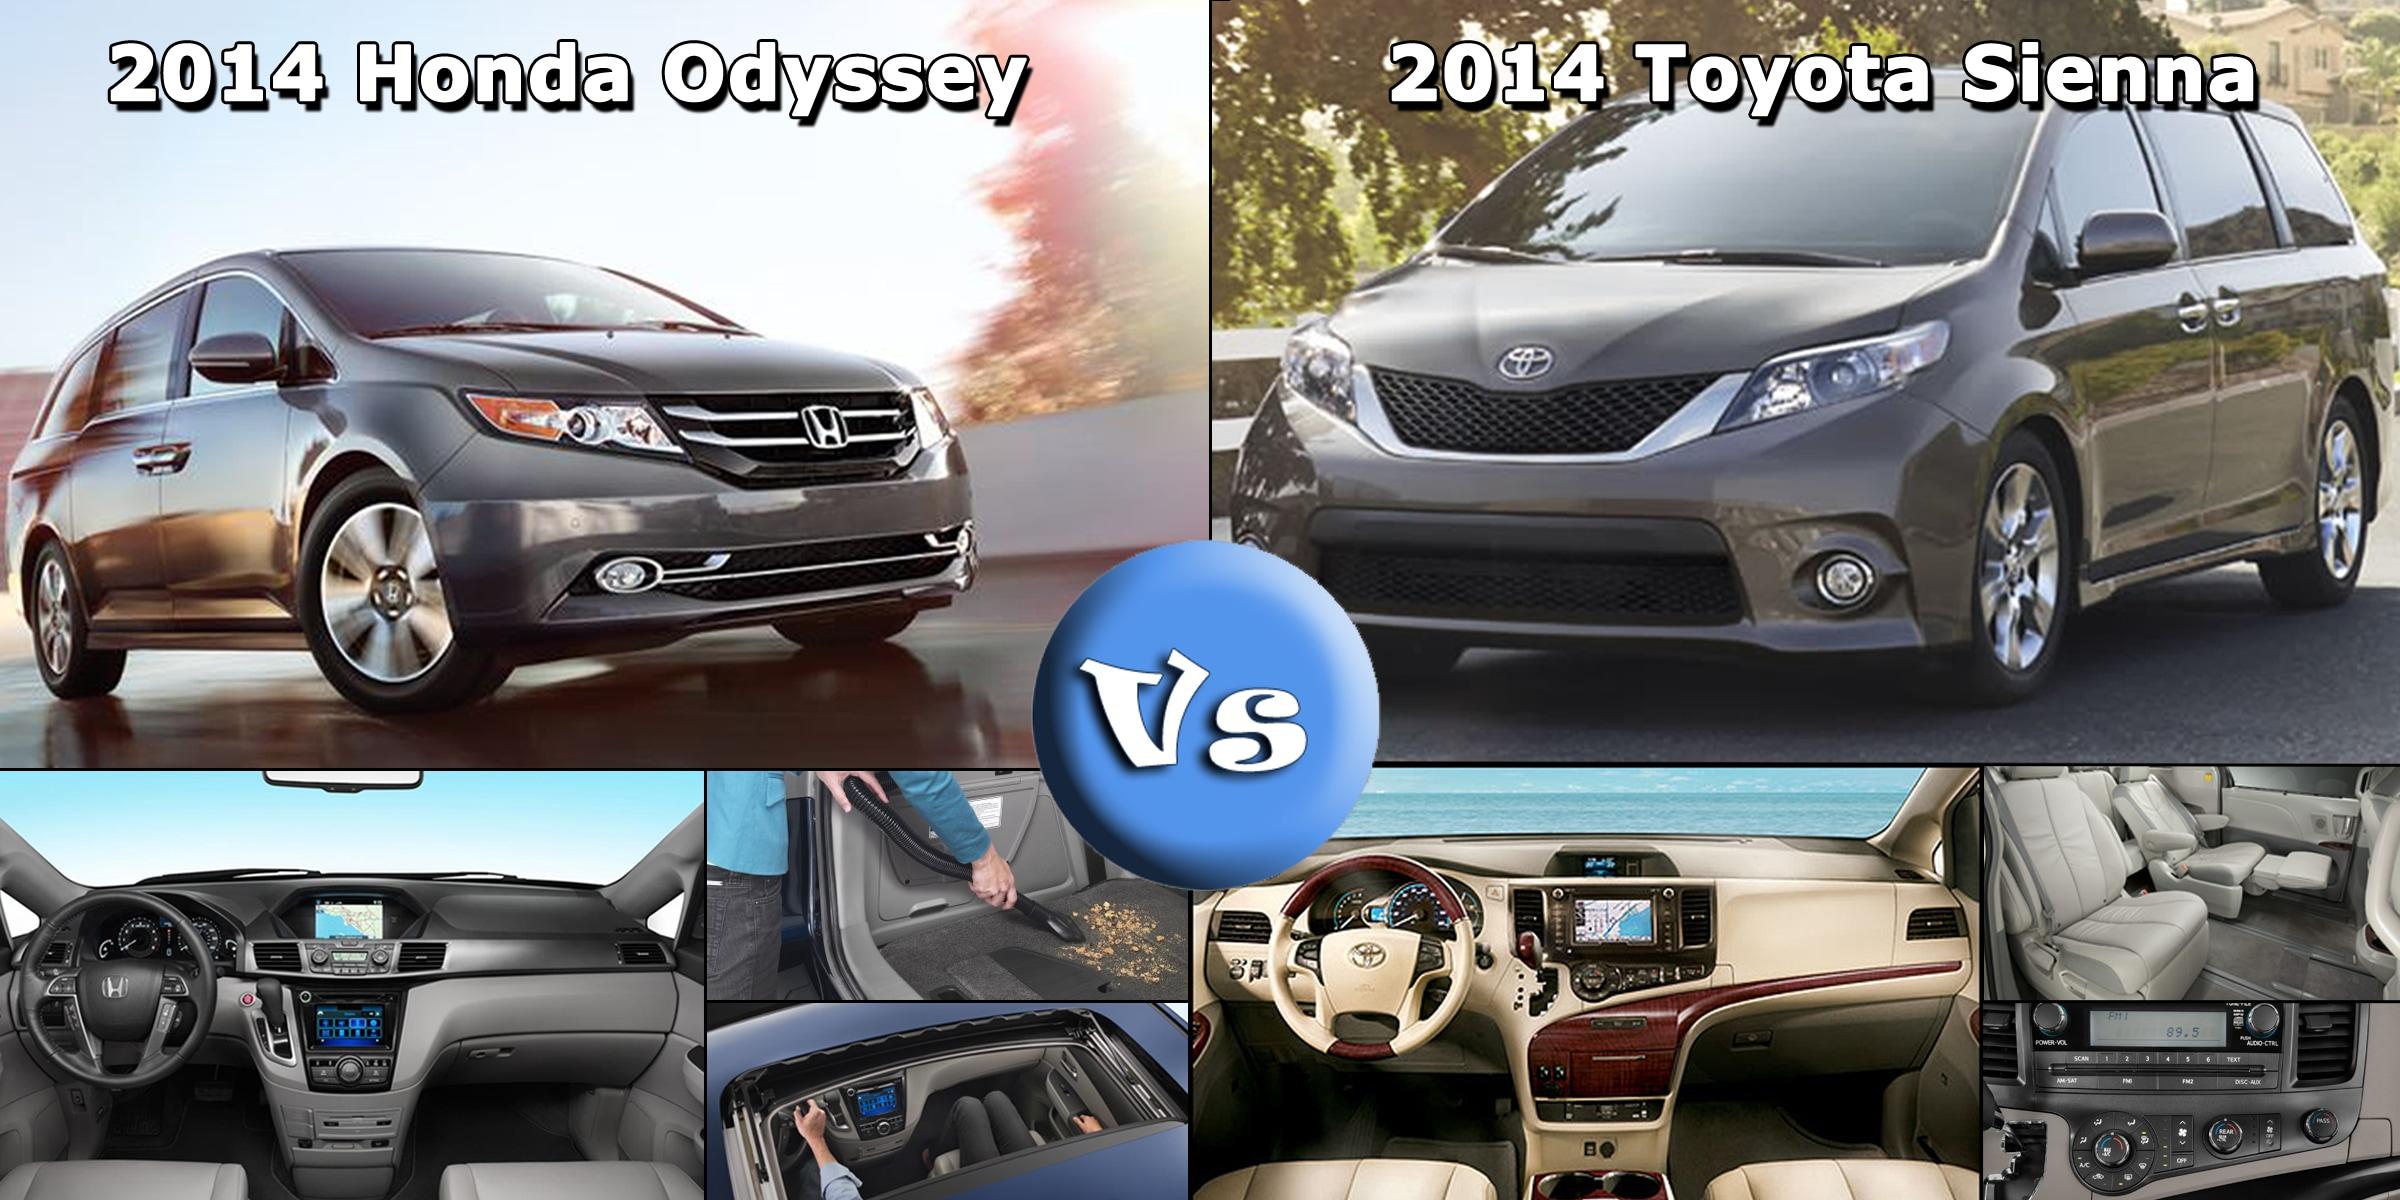 2014 Honda Odyssey Versus 2014 Toyota Sienna